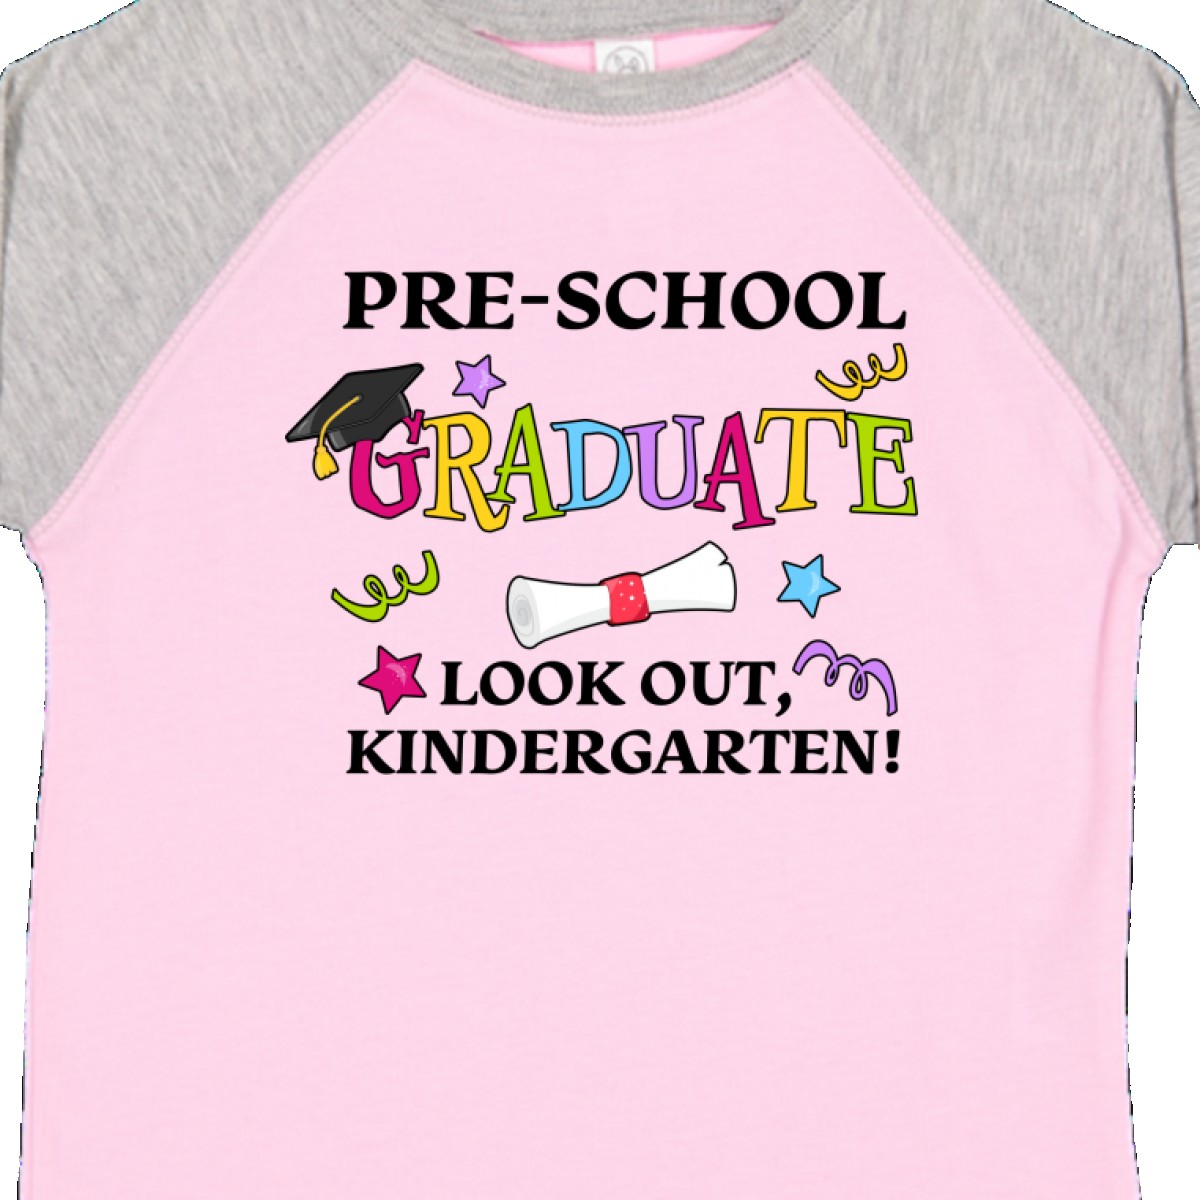 Inktastic-Pre-School-Graduate-Look-Out-Kindergarten-Toddler-T-Shirt-Graduation thumbnail 10